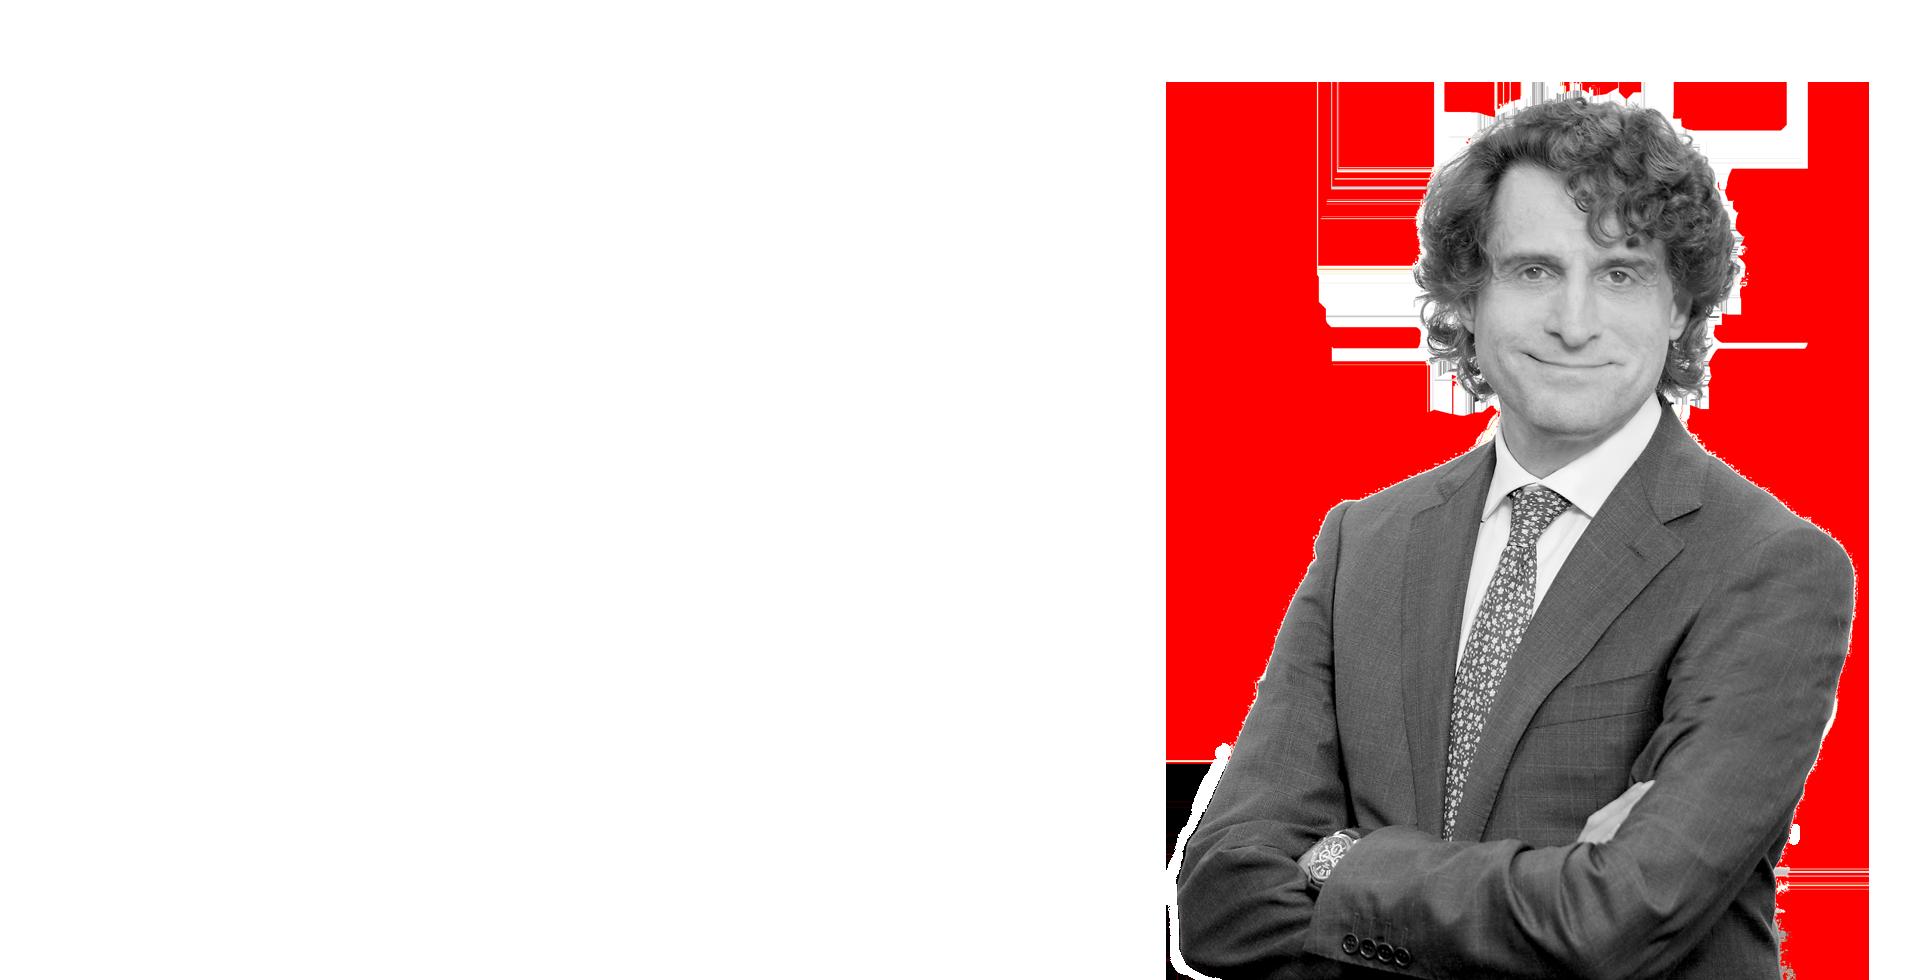 José Remohí